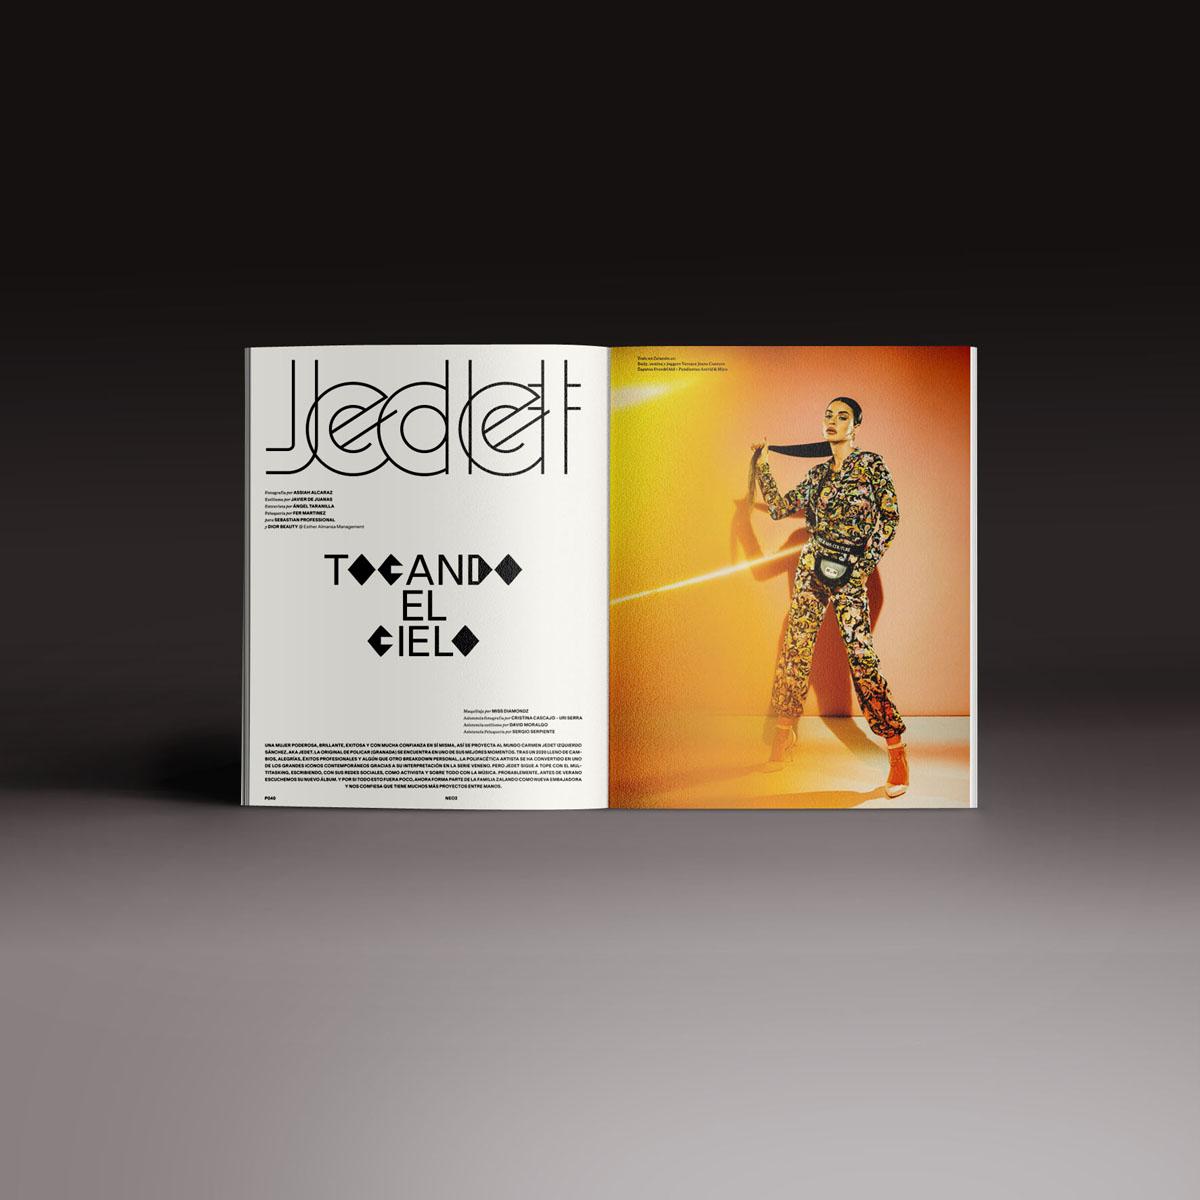 Neo2 Magazine doble pagina de Jedet